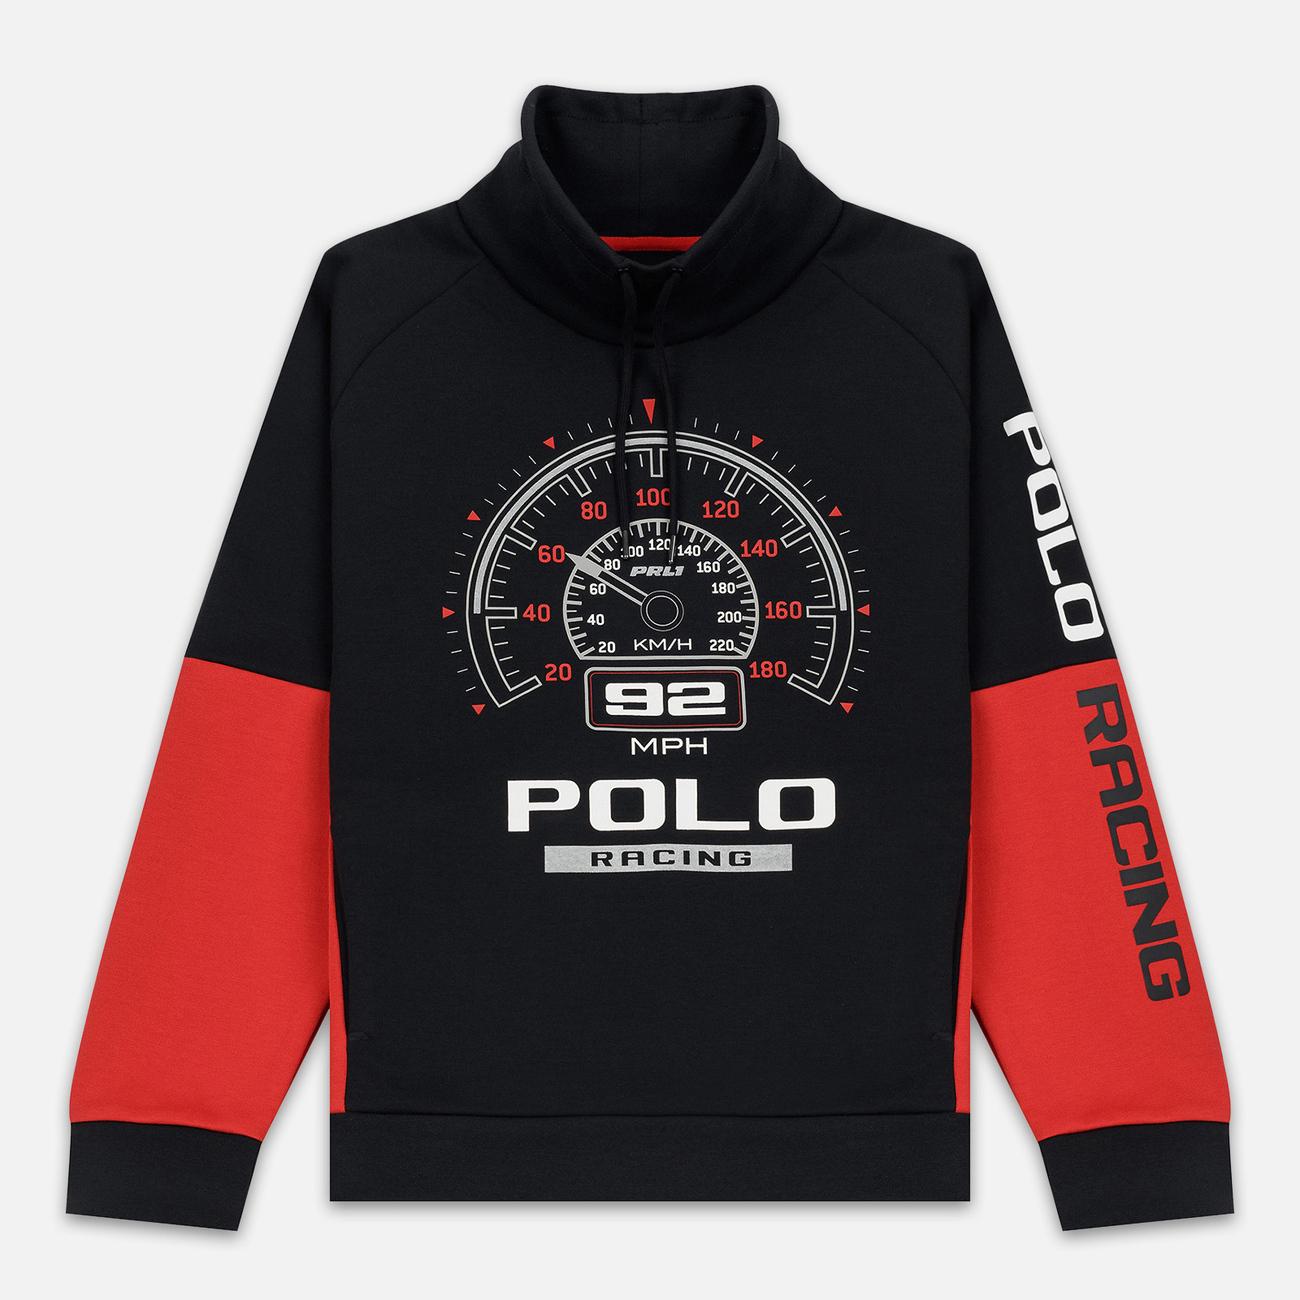 Мужская толстовка Polo Ralph Lauren Polo Racing Double Knit Tech Black